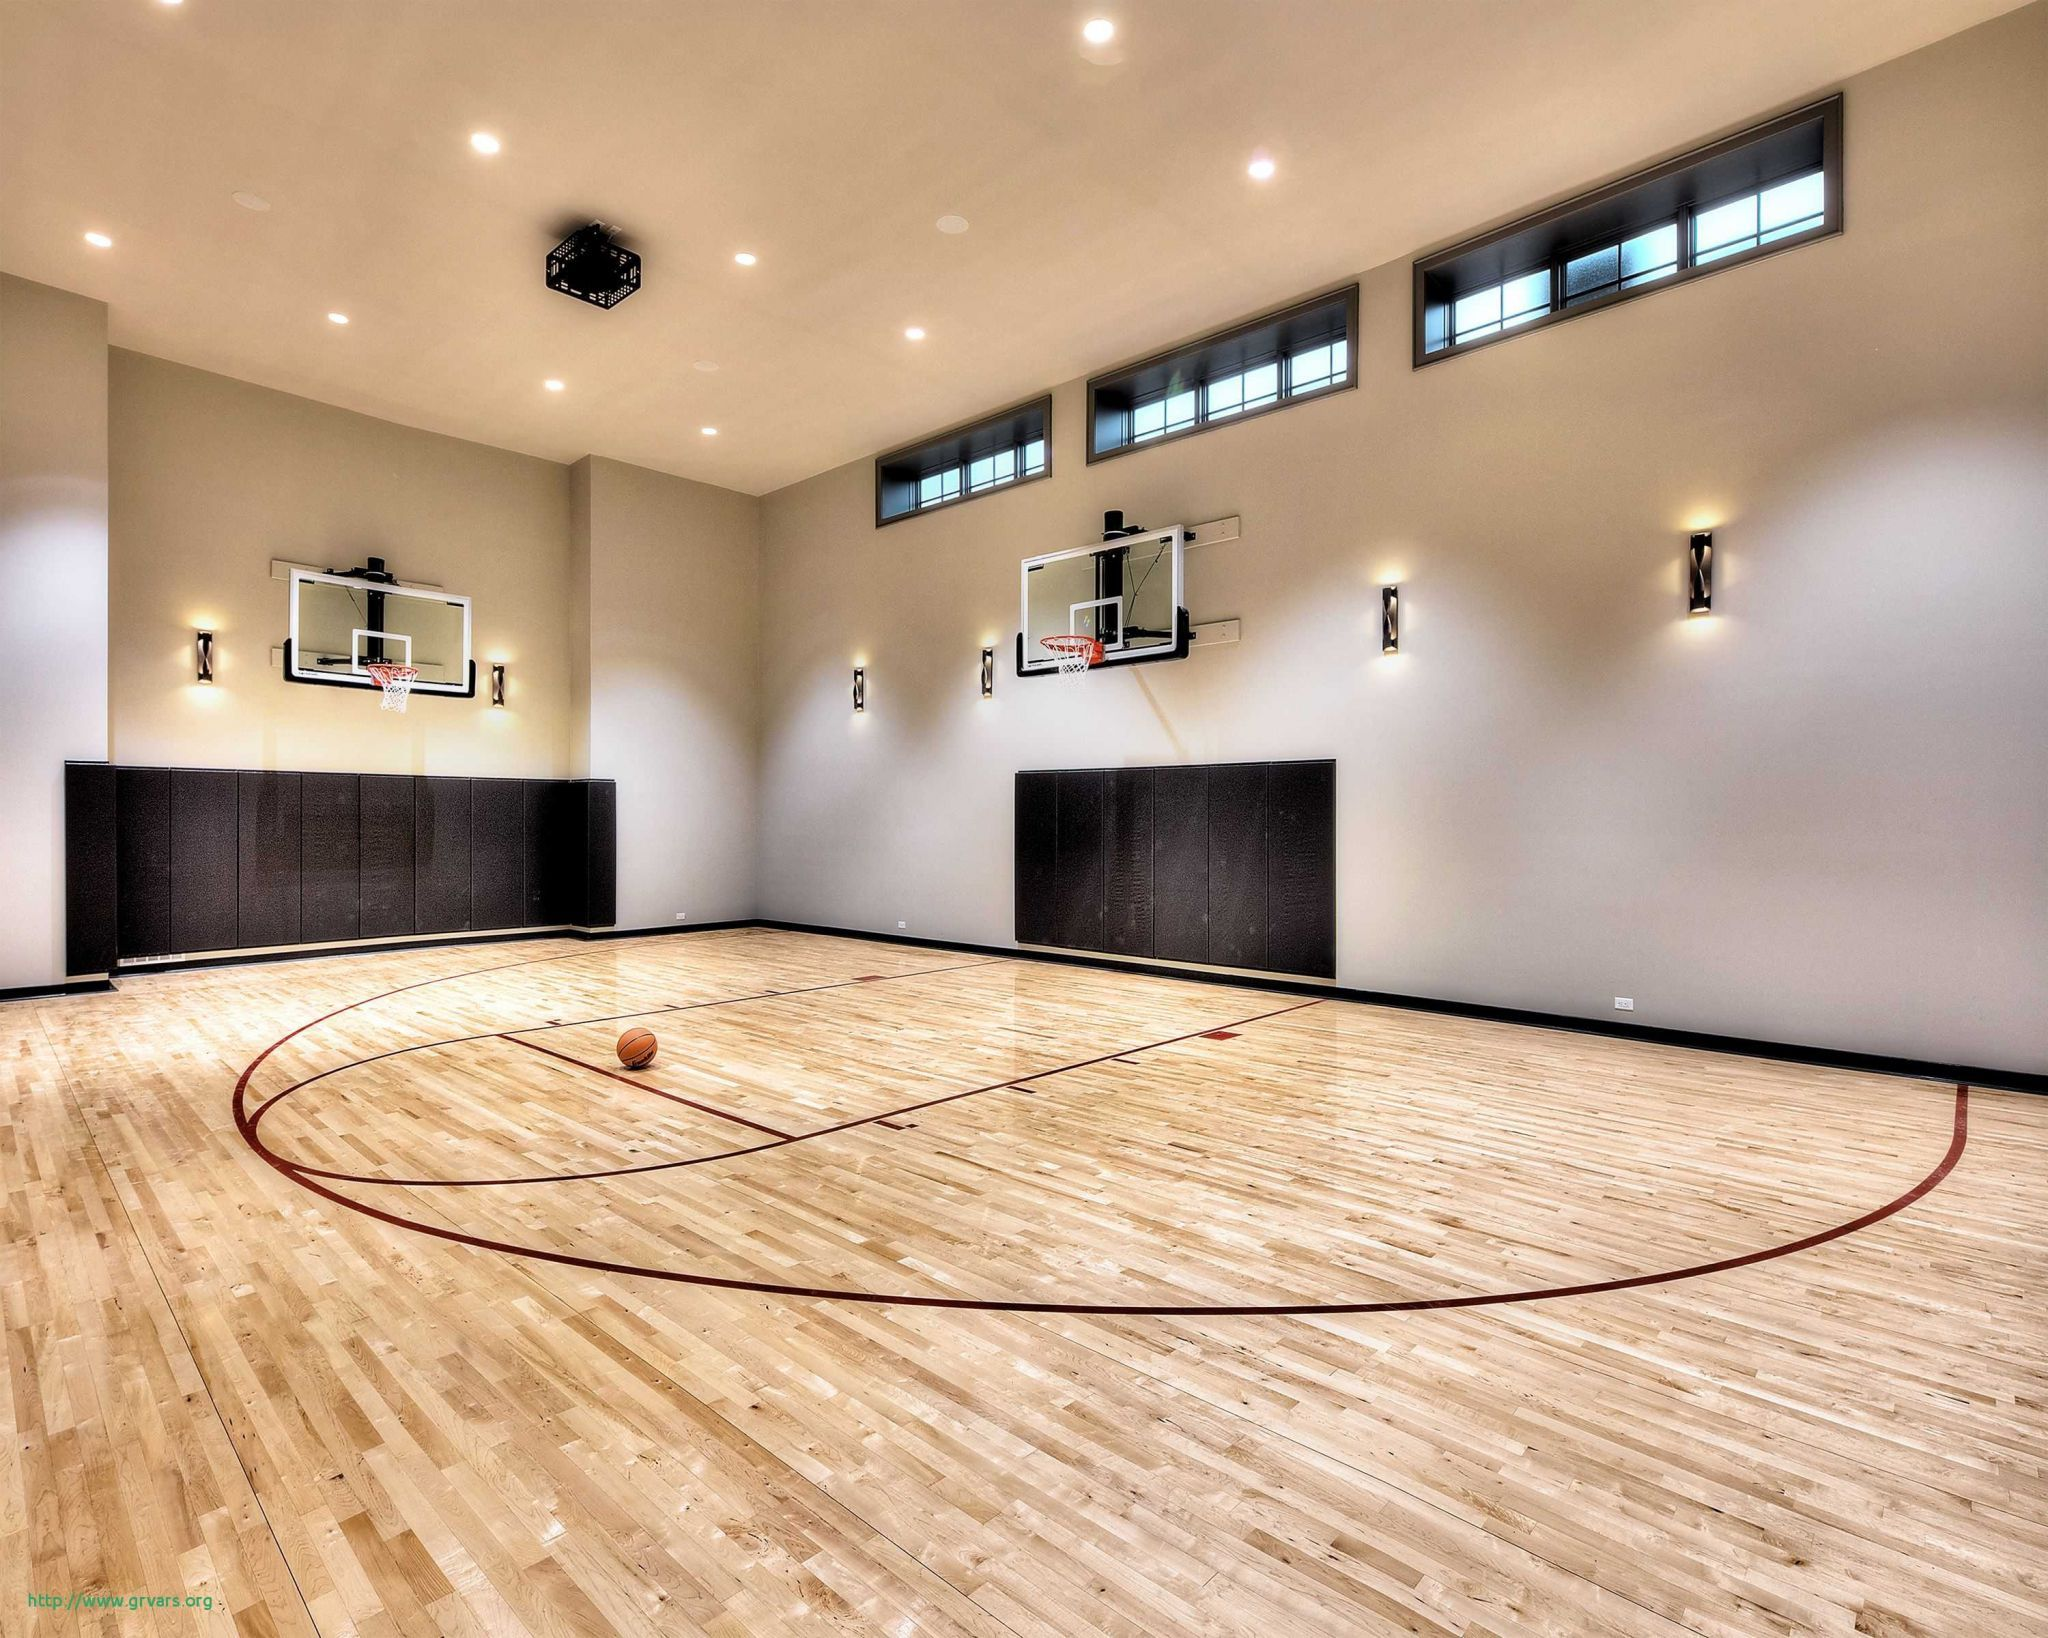 Floor Plans With Indoor Basketball Court Home Basketball Court Basketball Room Indoor Basketball Court